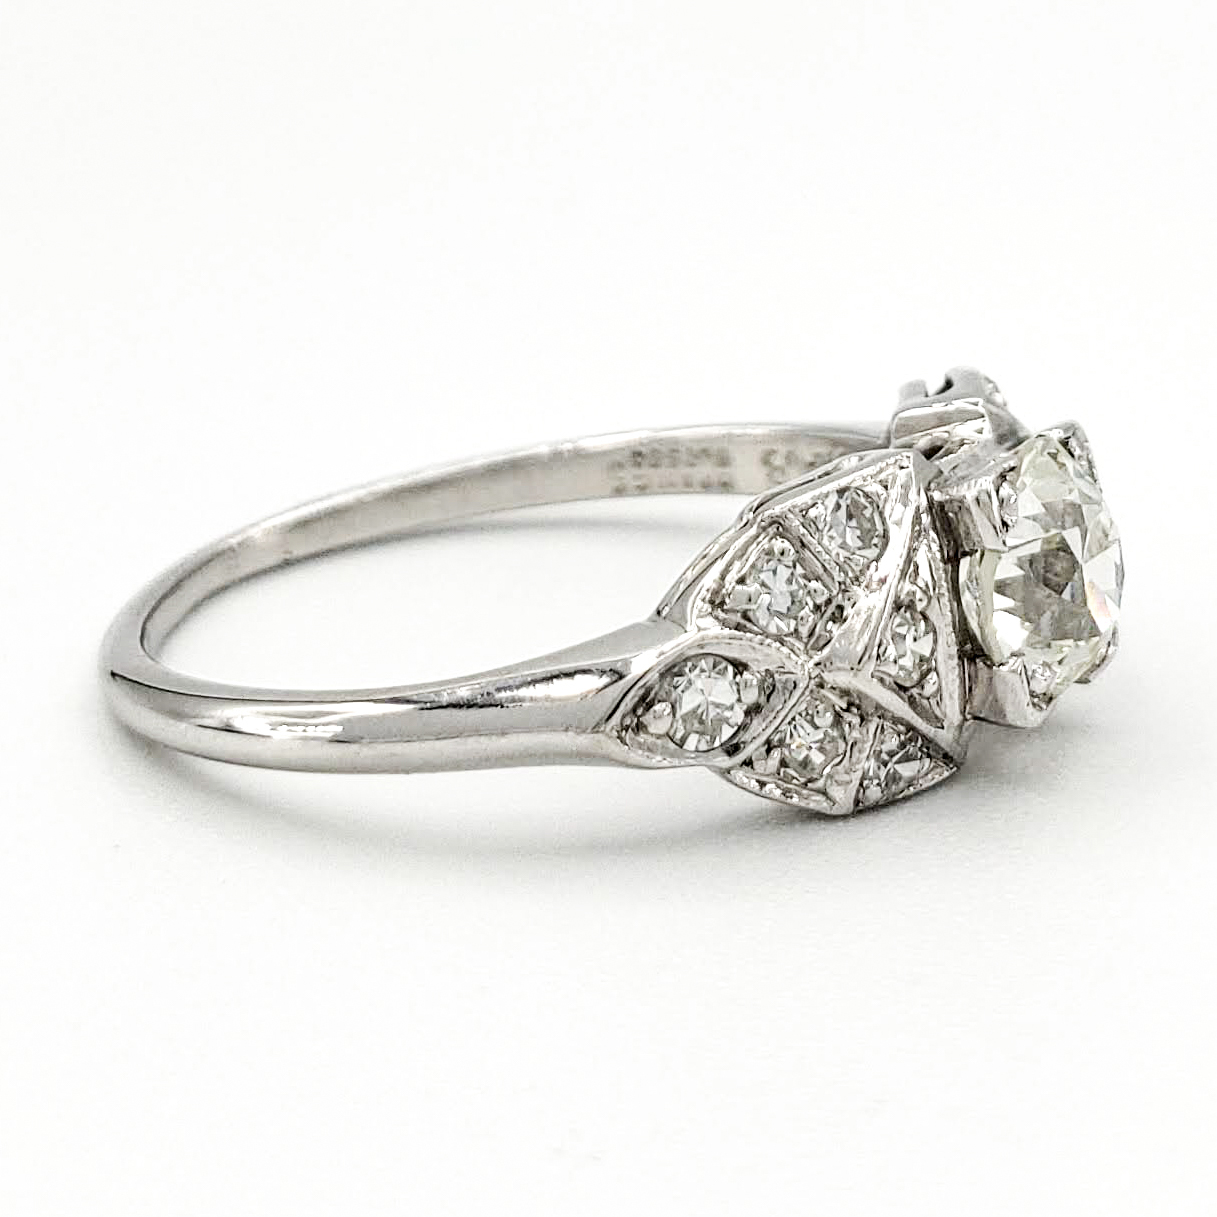 vintage-platinum-engagement-ring-with-0-57-carat-old-european-cut-diamond-egl-j-vs1